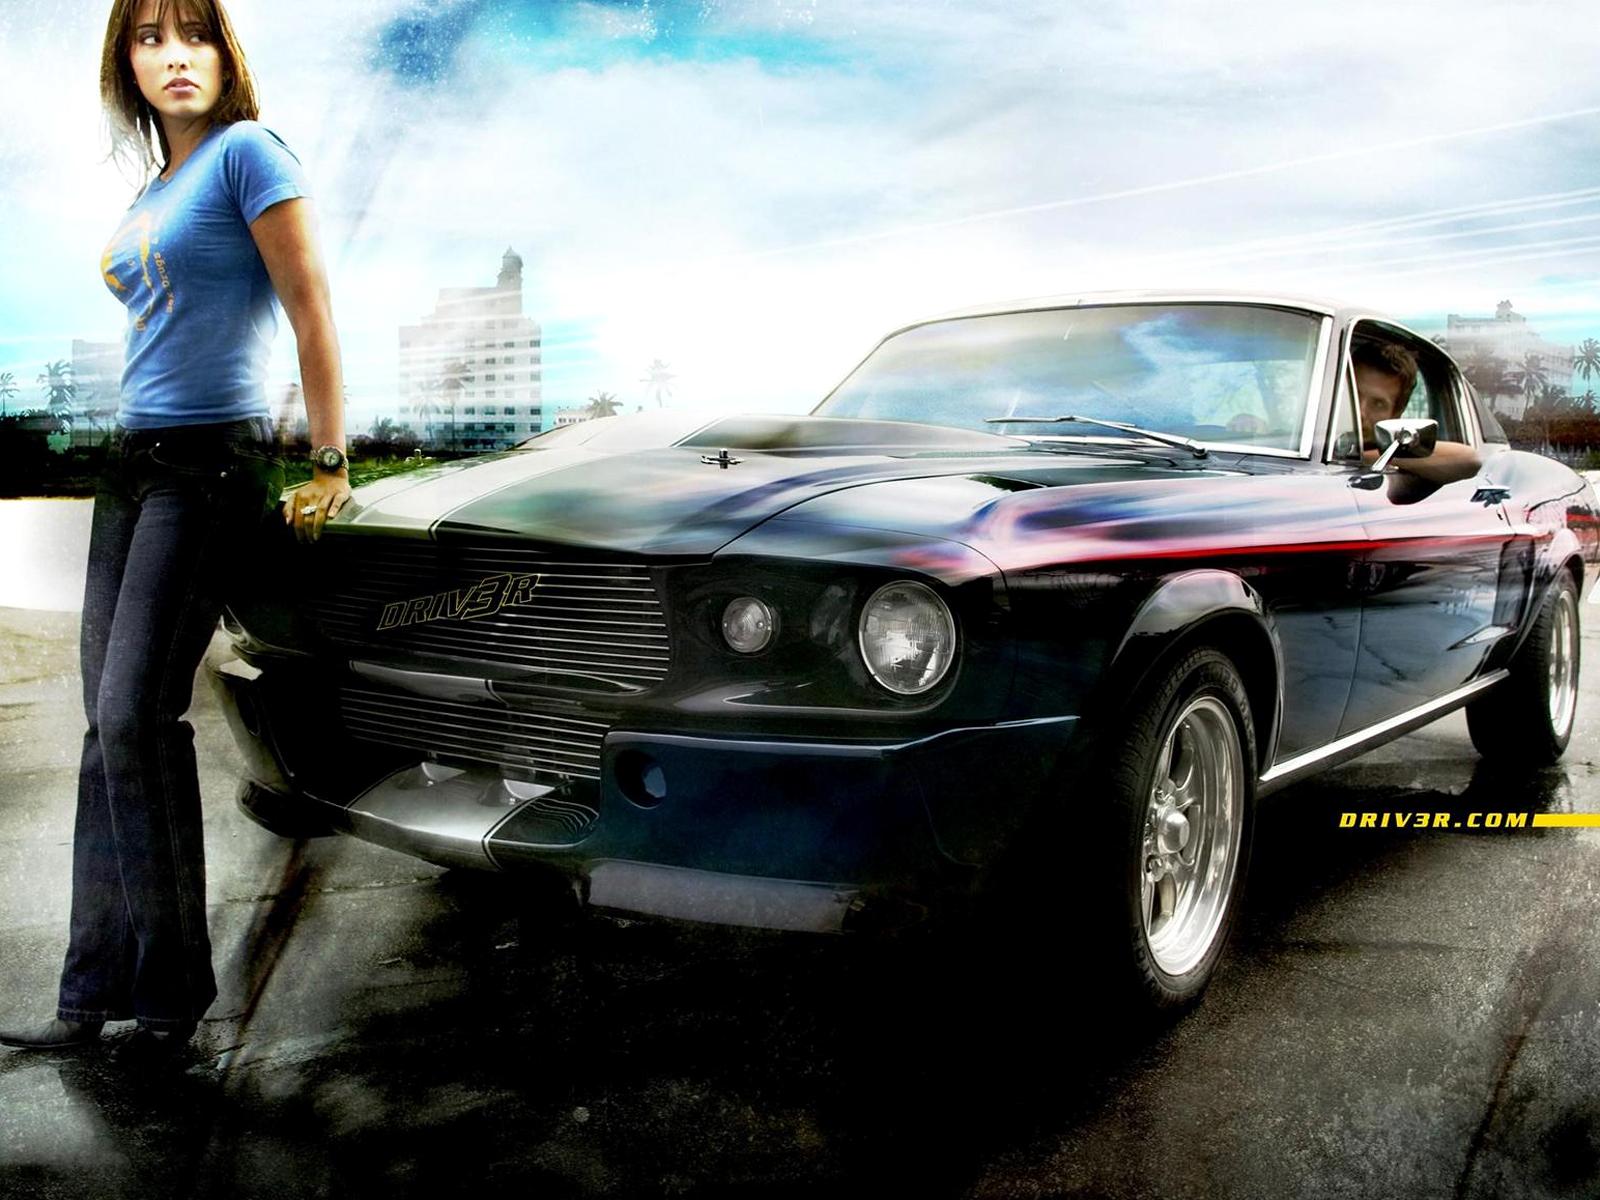 http://4.bp.blogspot.com/-vwUqGfnp2iw/Tay3IB2Cs4I/AAAAAAAAHQU/85_nPAotp8Q/s1600/driver-girl-and-car-wallpapers_1948_1600.jpg